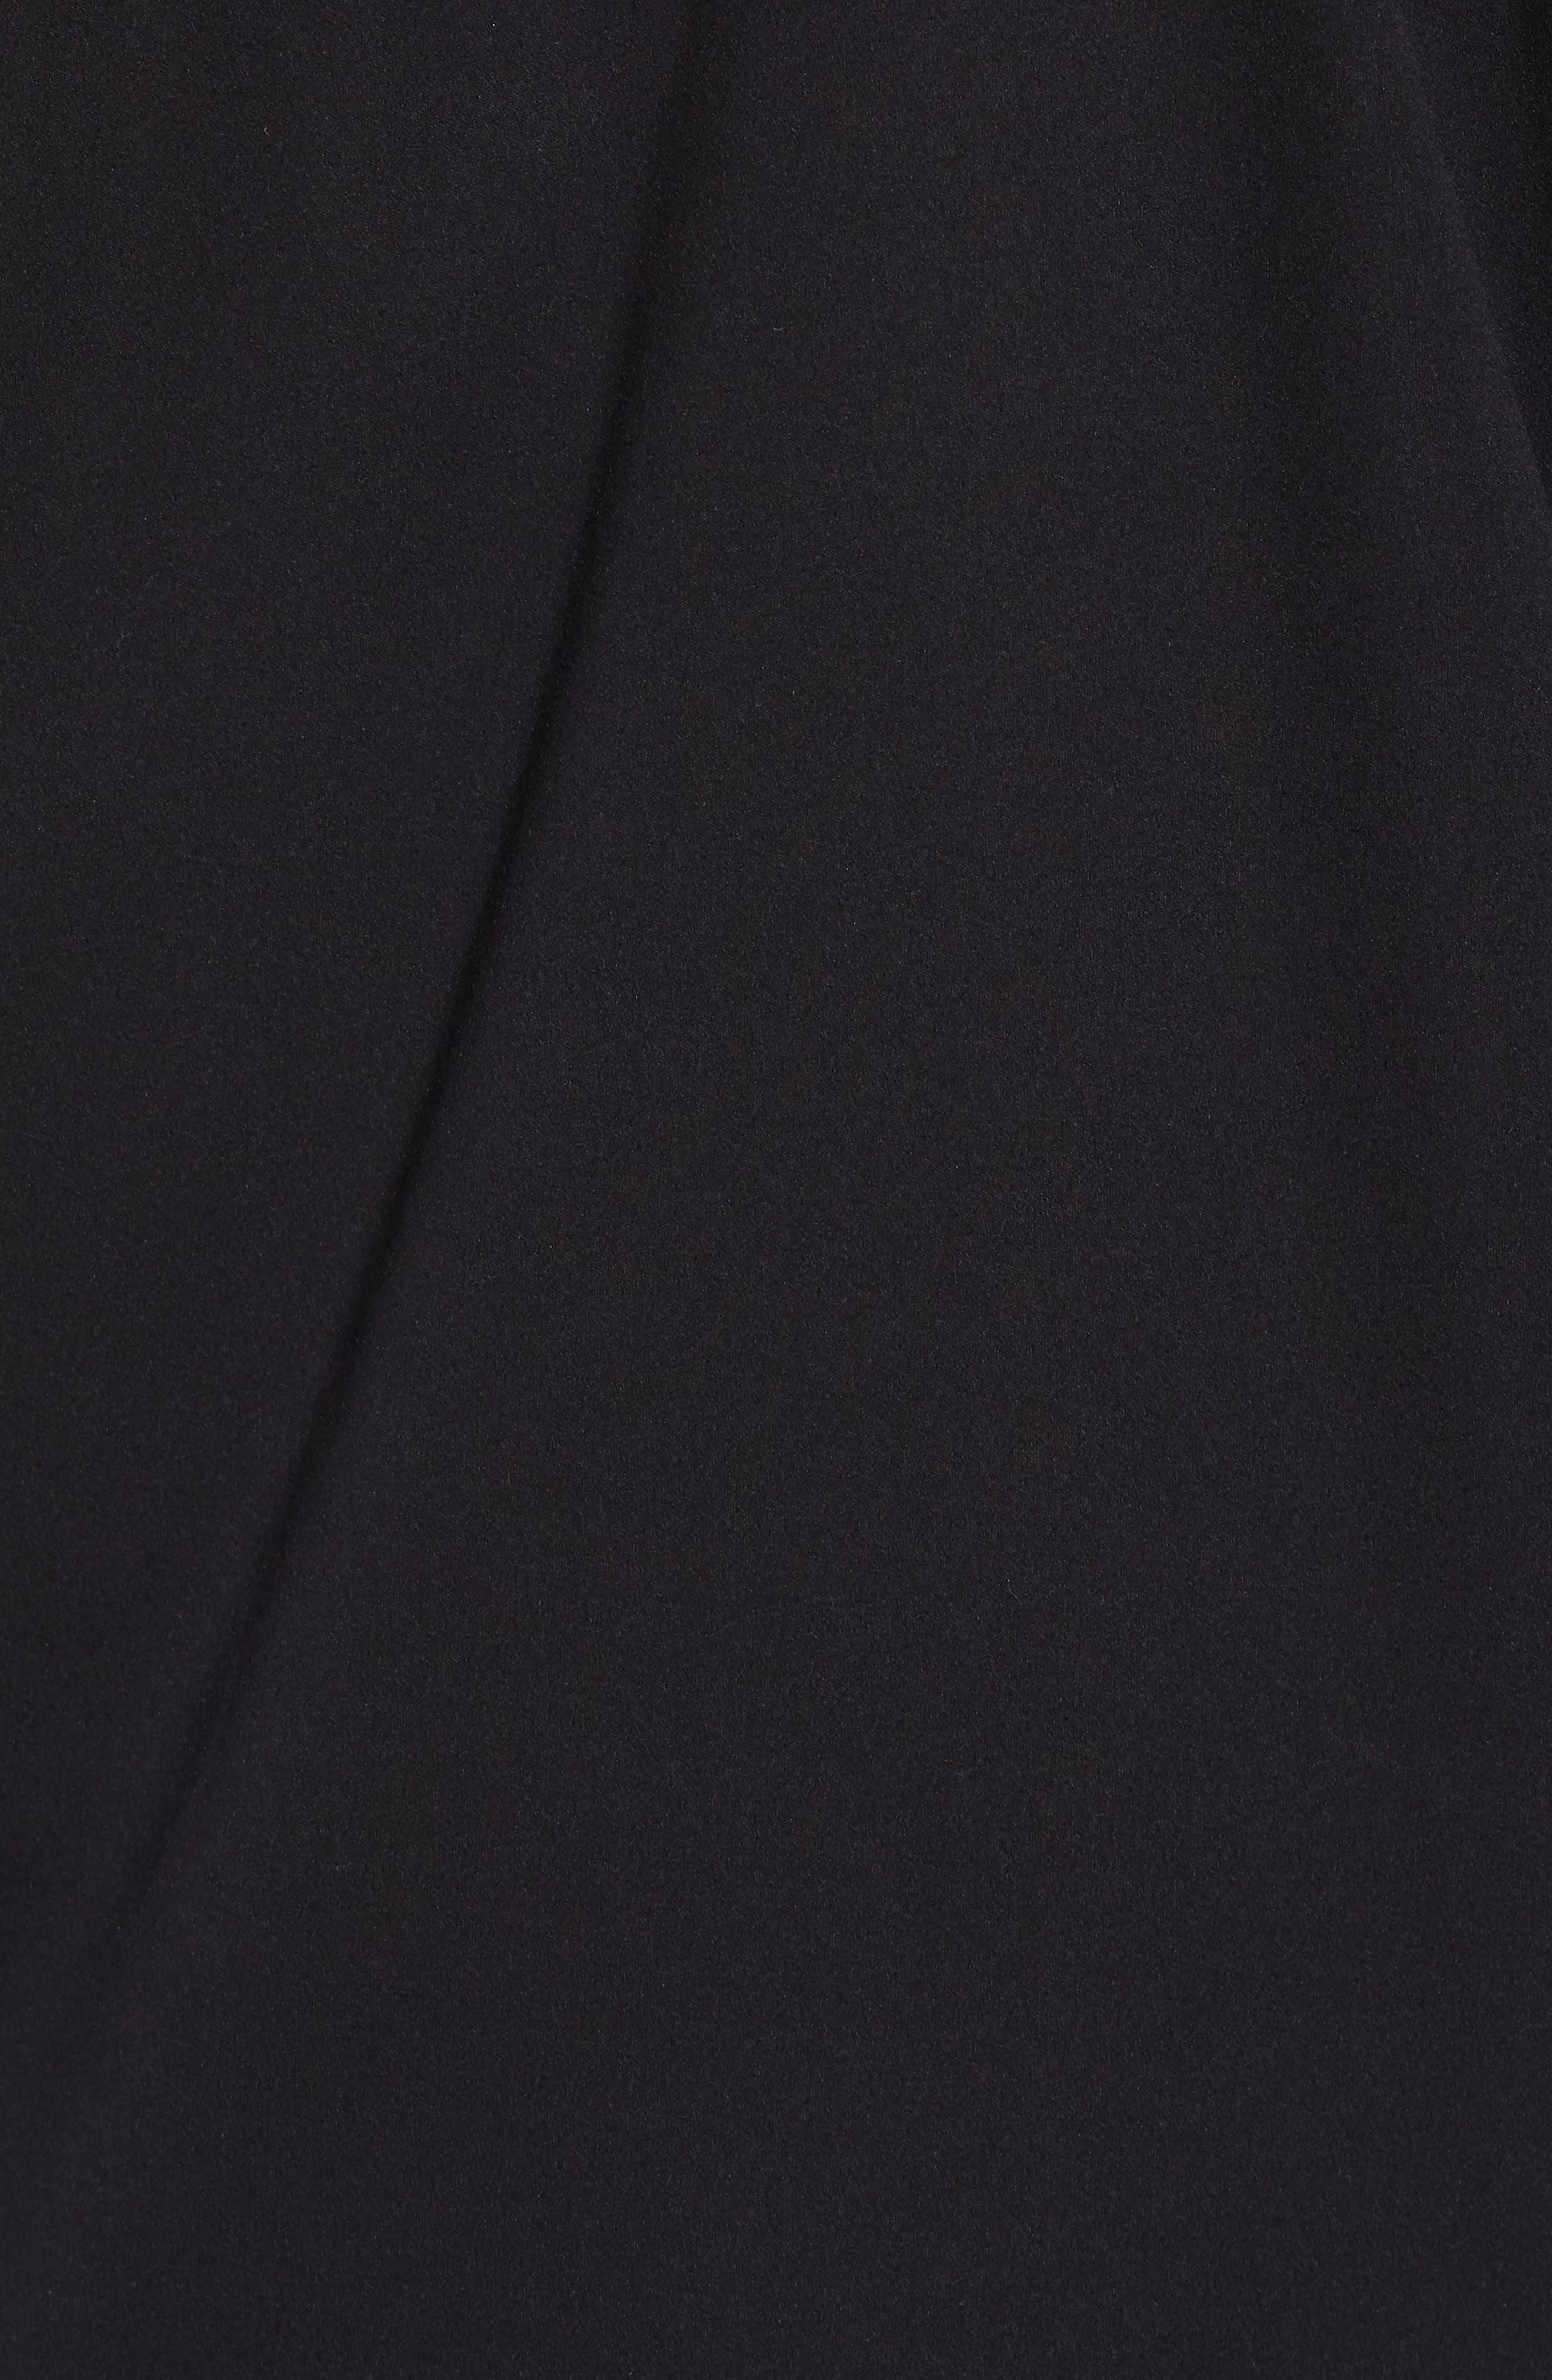 Allproof Stretch Hooded Rain Jacket,                             Alternate thumbnail 7, color,                             TNF BLACK